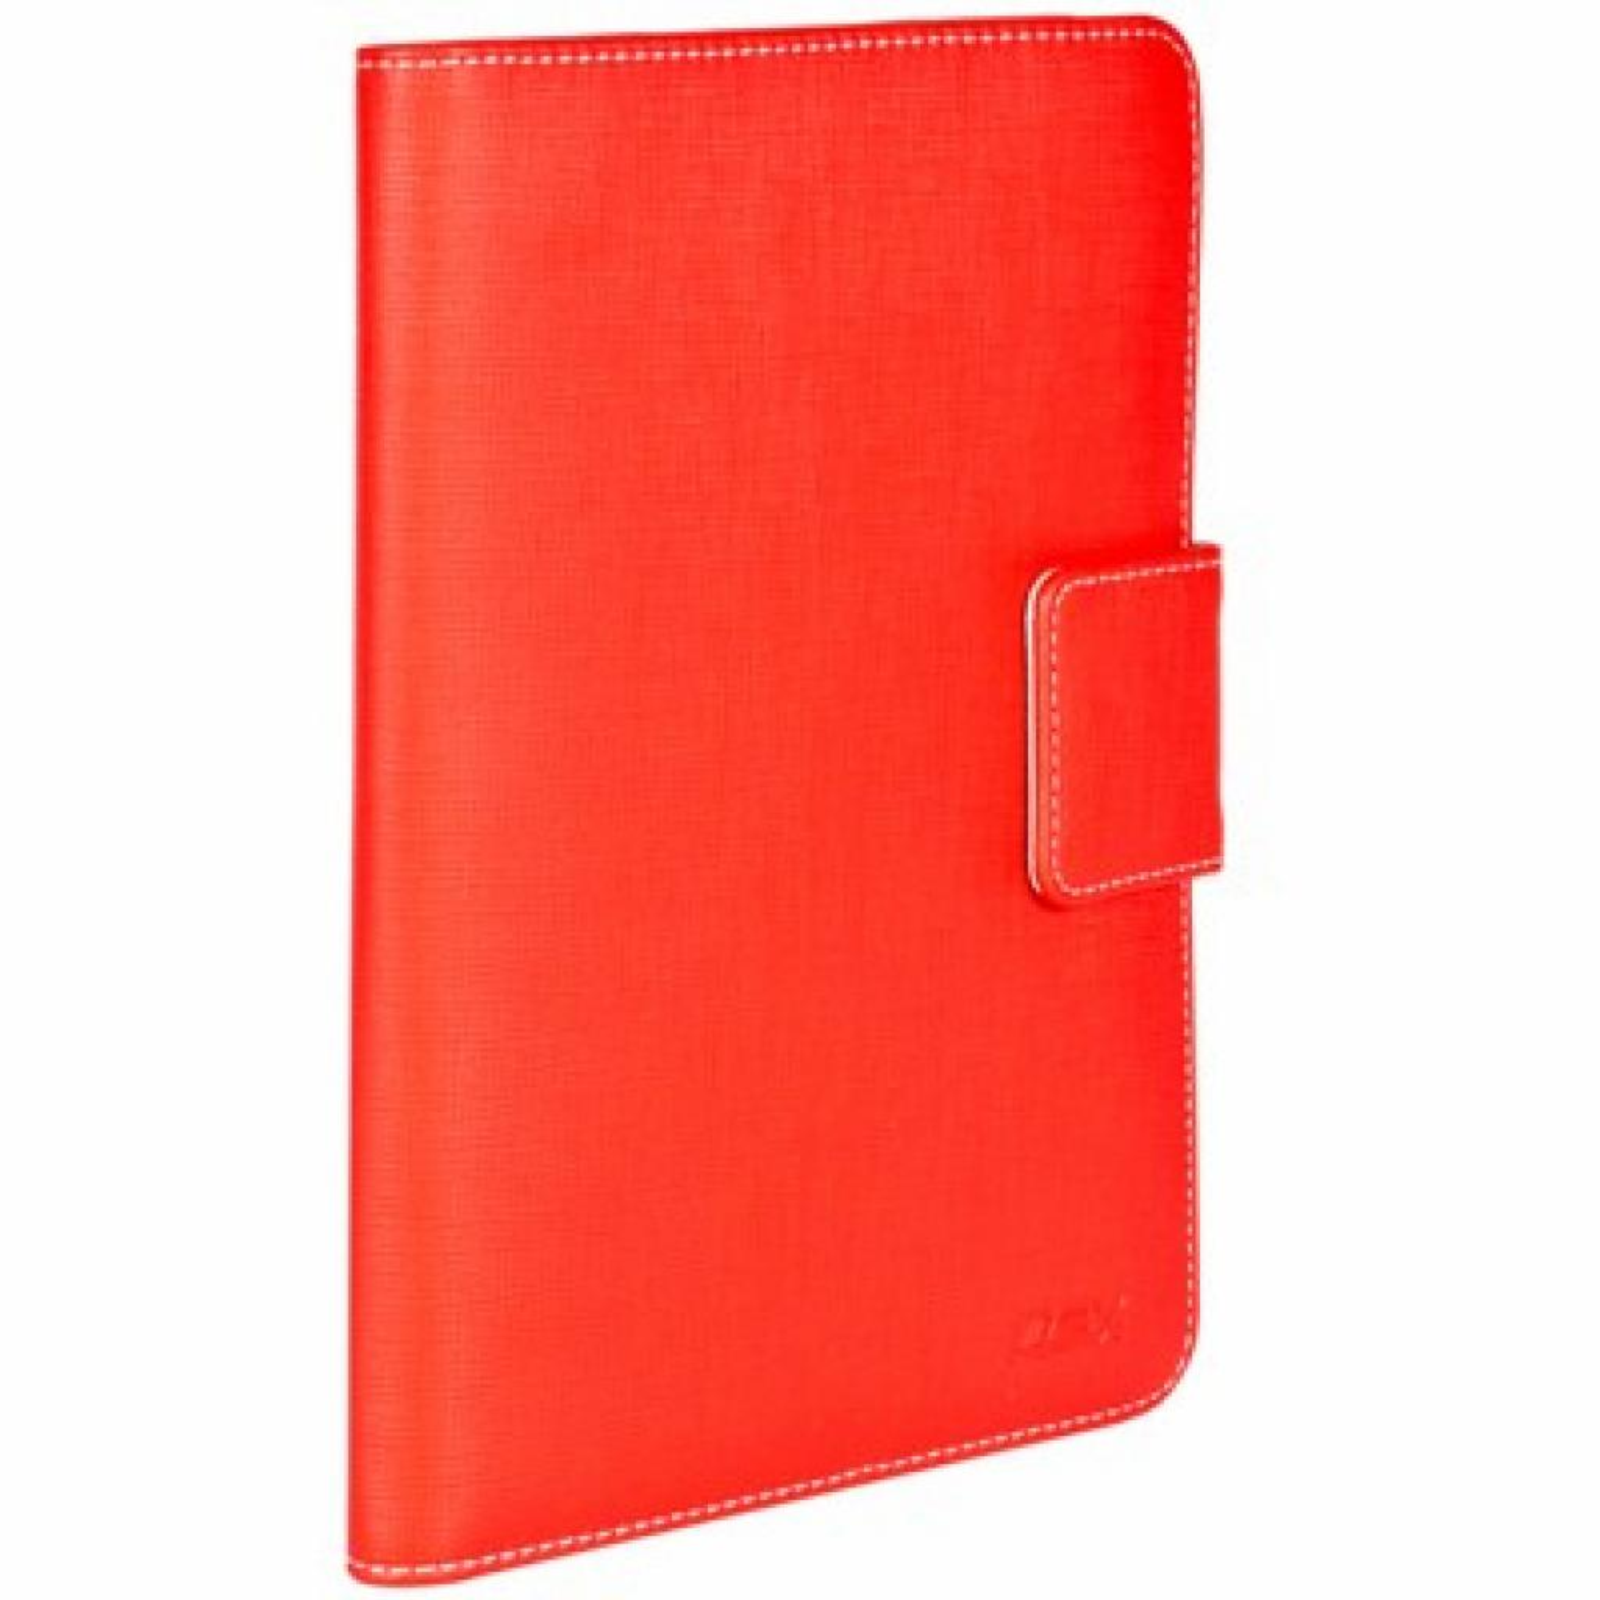 "Чехол для планшета Lex 7"" Universal (Red) (LXTC-4007RD)"